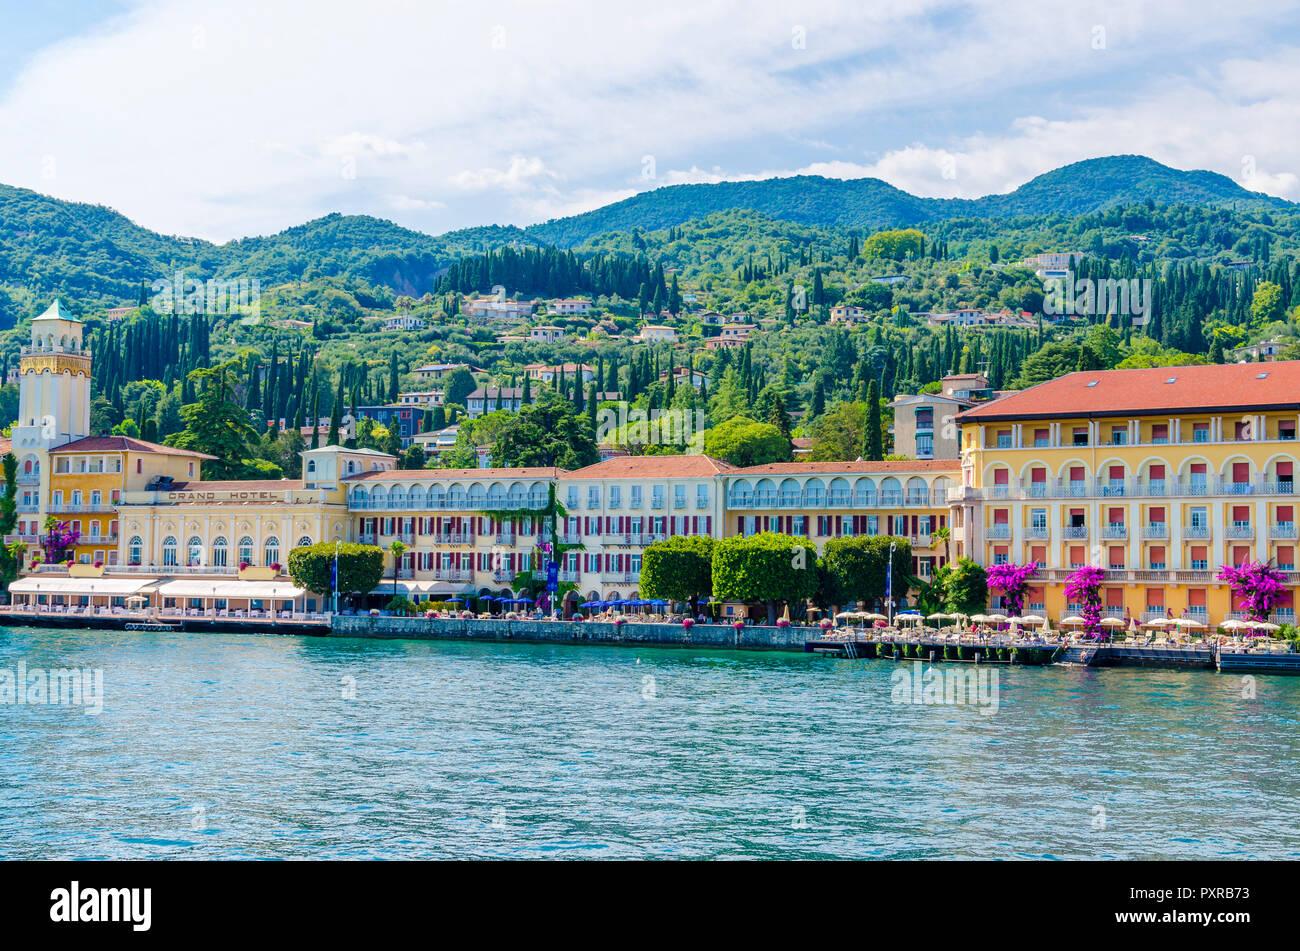 Italy, Lombardy, Gardone Riviera, Lake Garda, Grandhotel Stock Photo